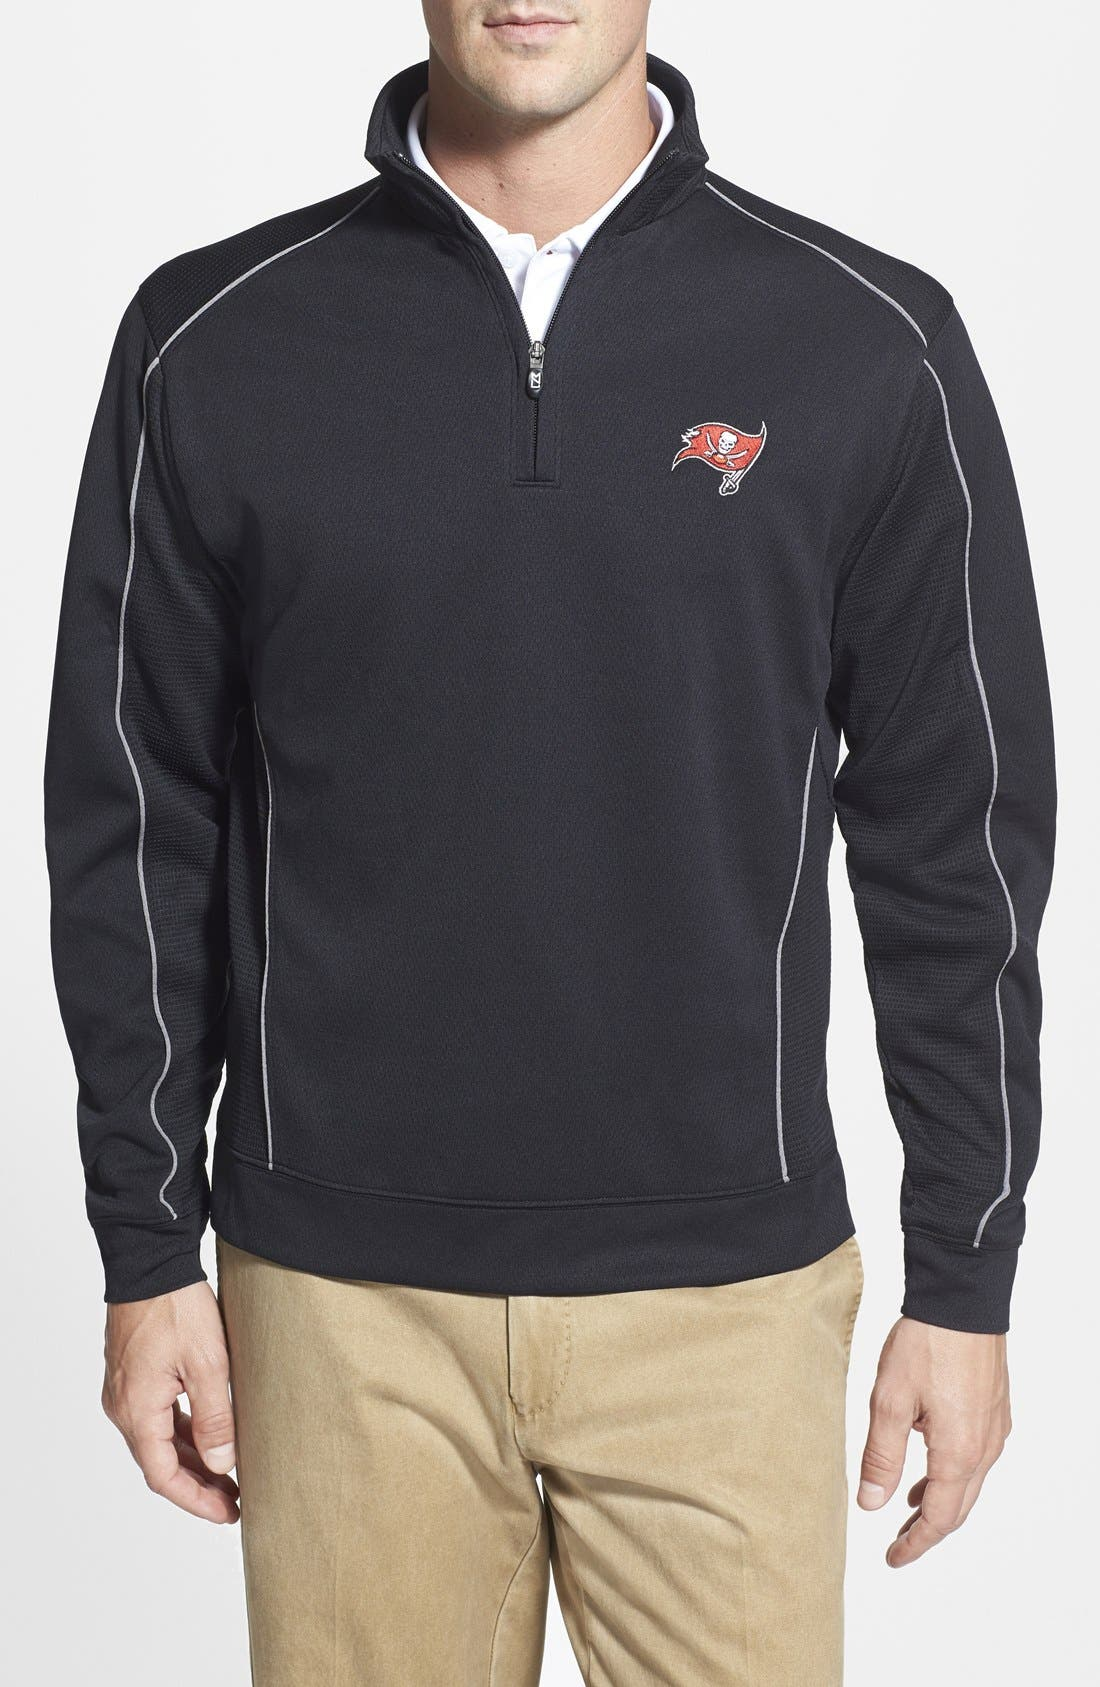 Tampa Bay Buccaneers - Edge DryTec Moisture Wicking Half Zip Pullover,                             Main thumbnail 1, color,                             Black